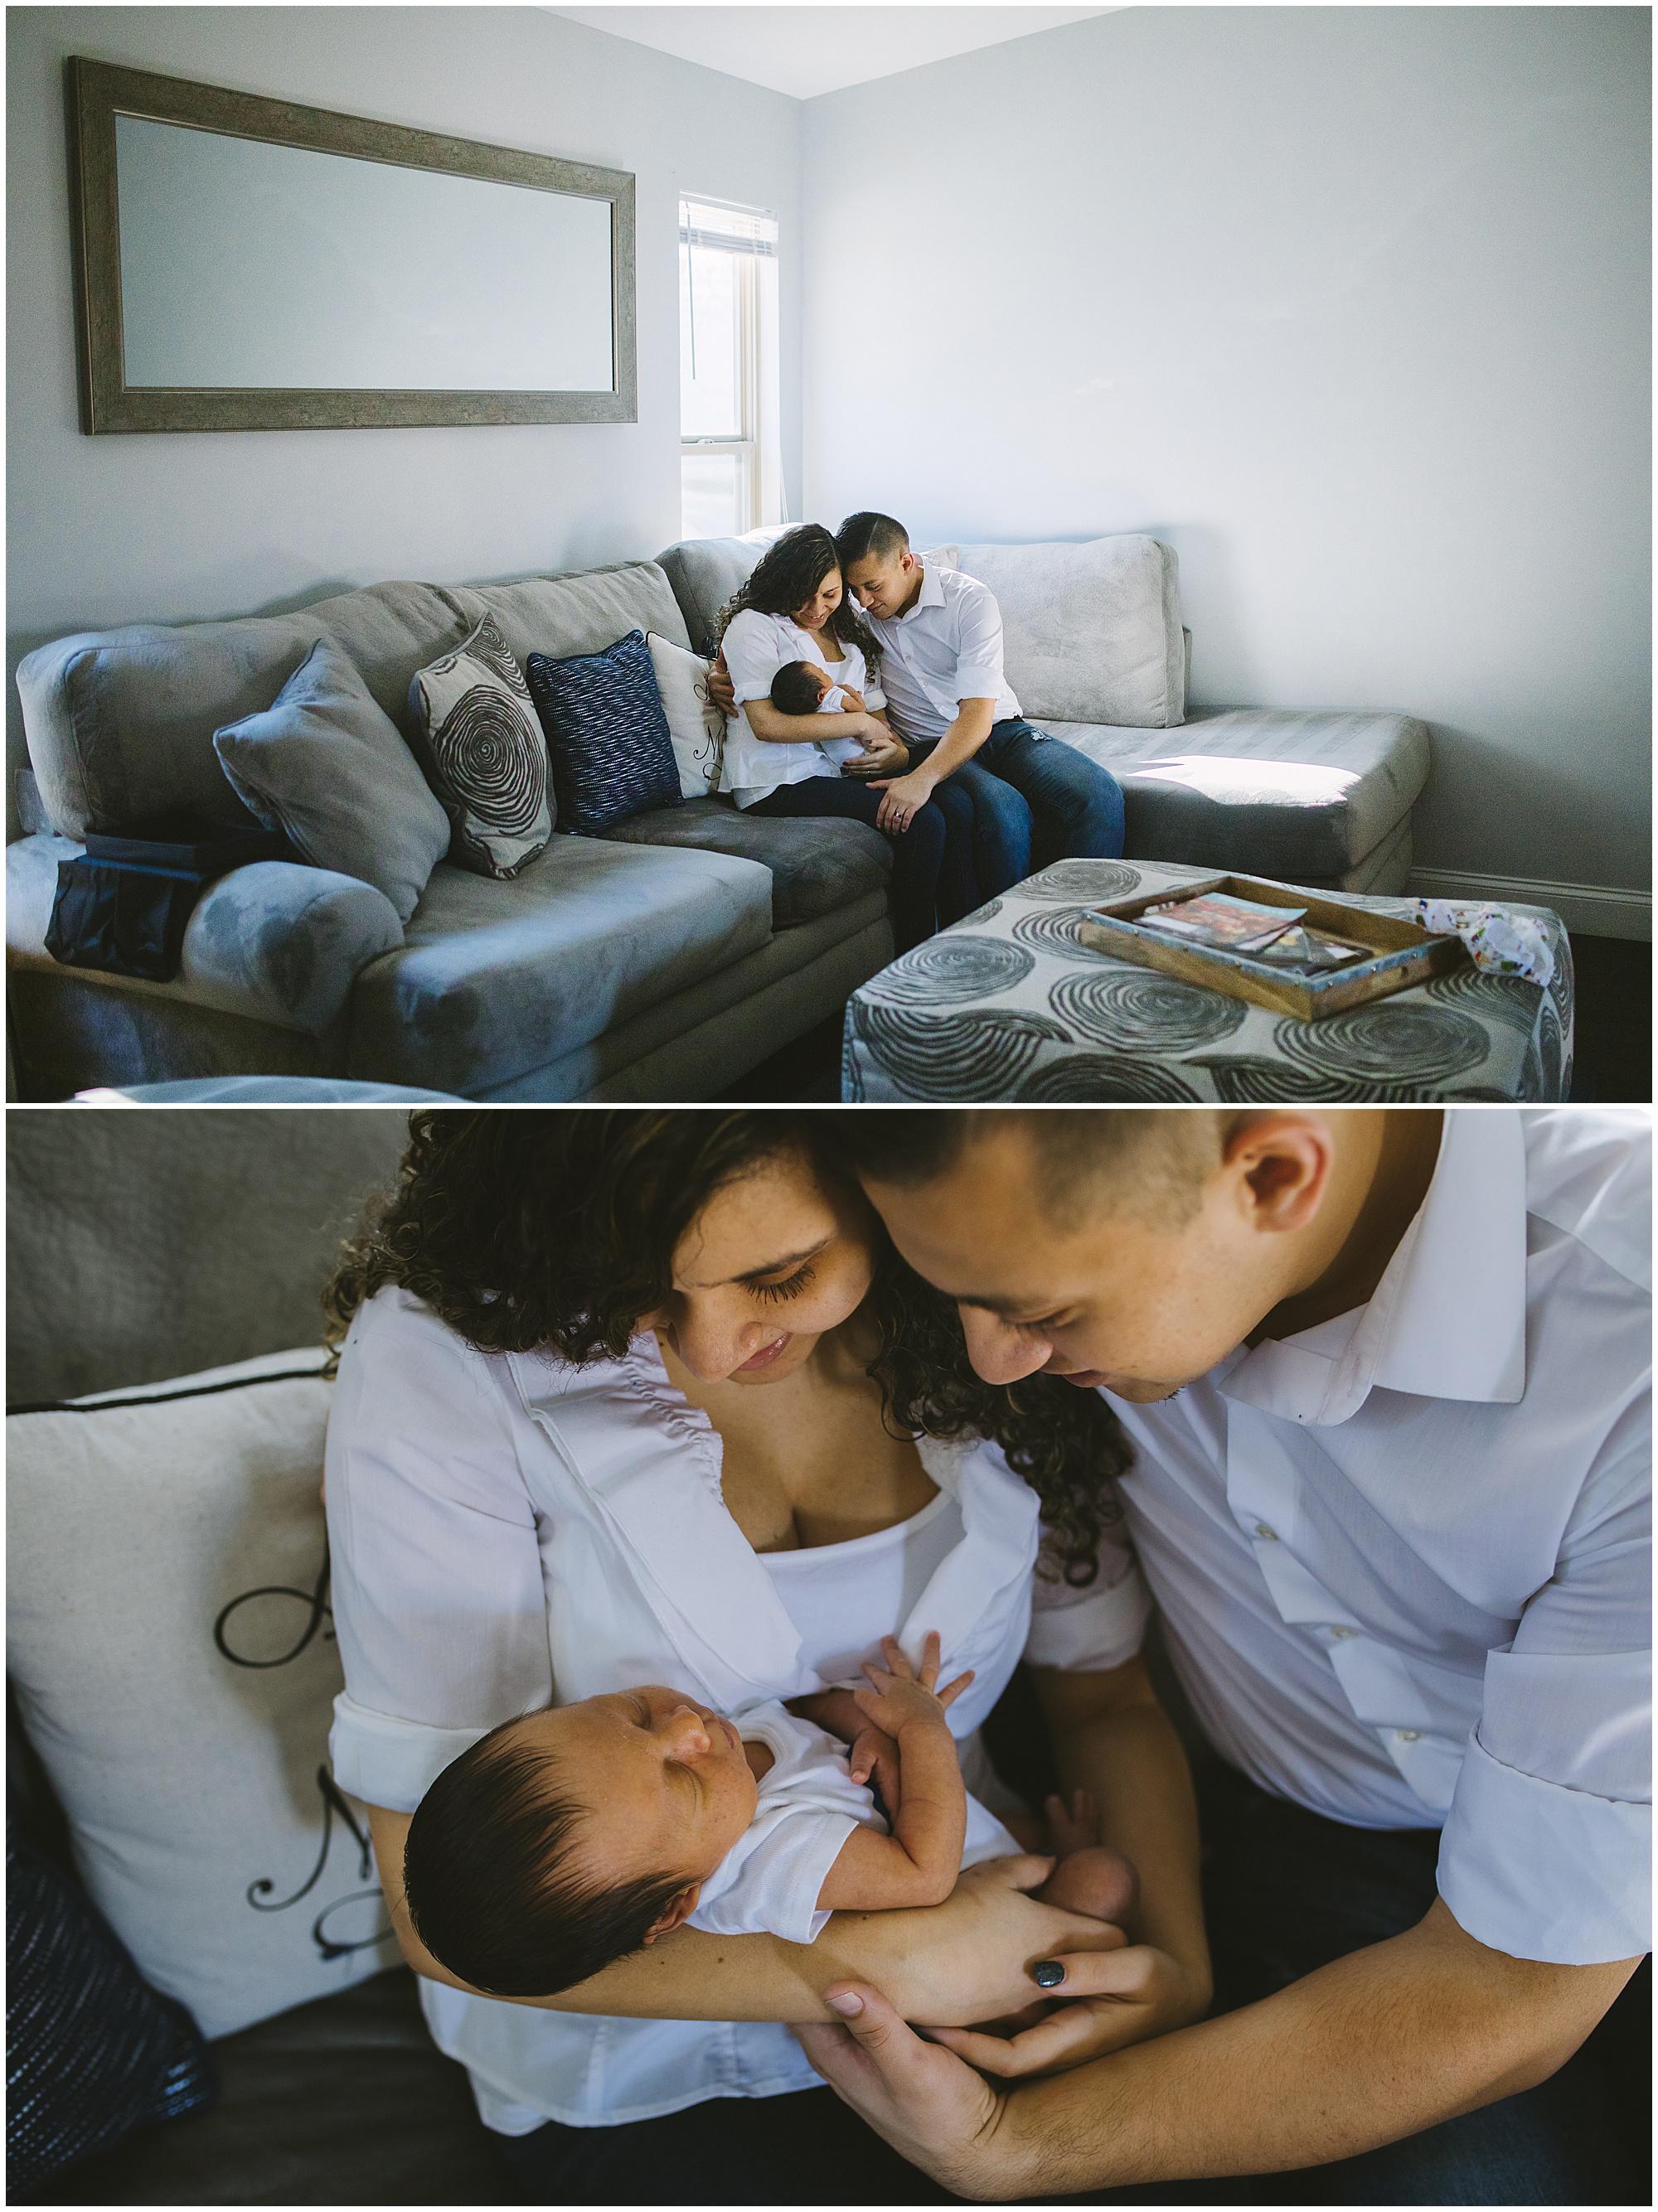 Emily-Lapish-Photo-Film-documentary-newborn-session_0003.jpg